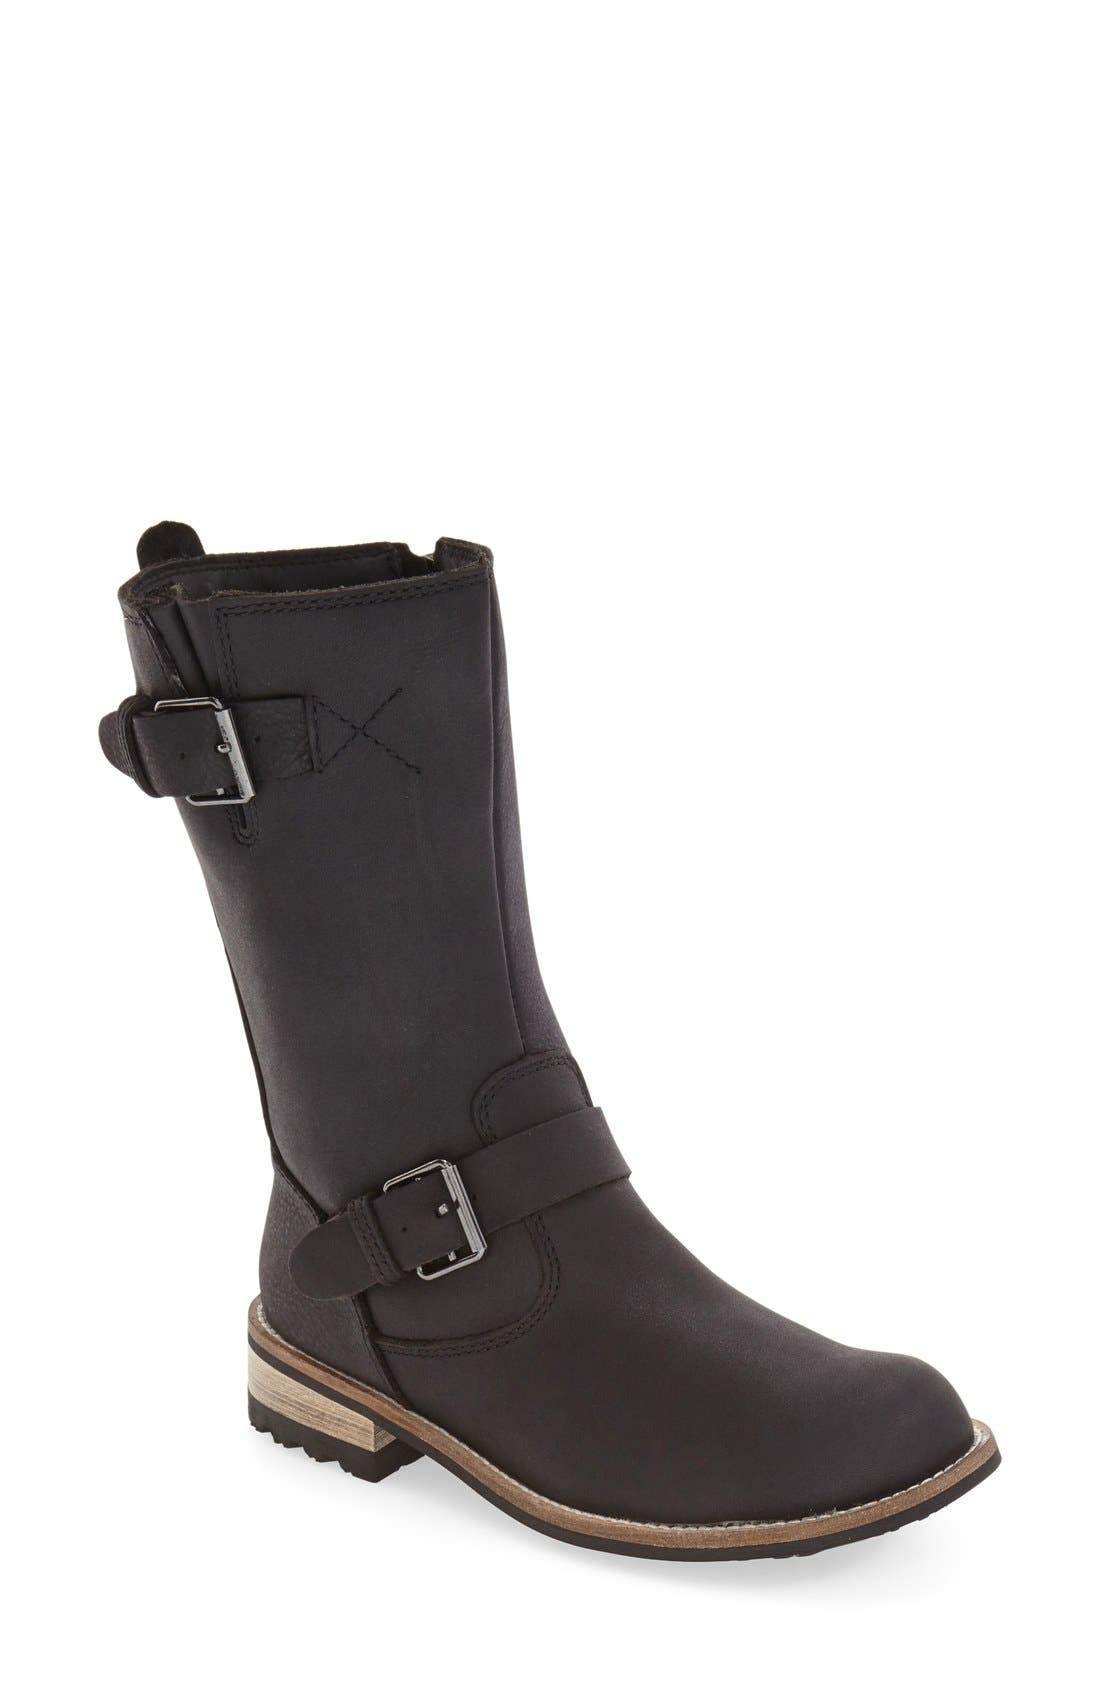 KODIAK 'Alcona' Waterproof Boot, Main, color, BLACK LEATHER